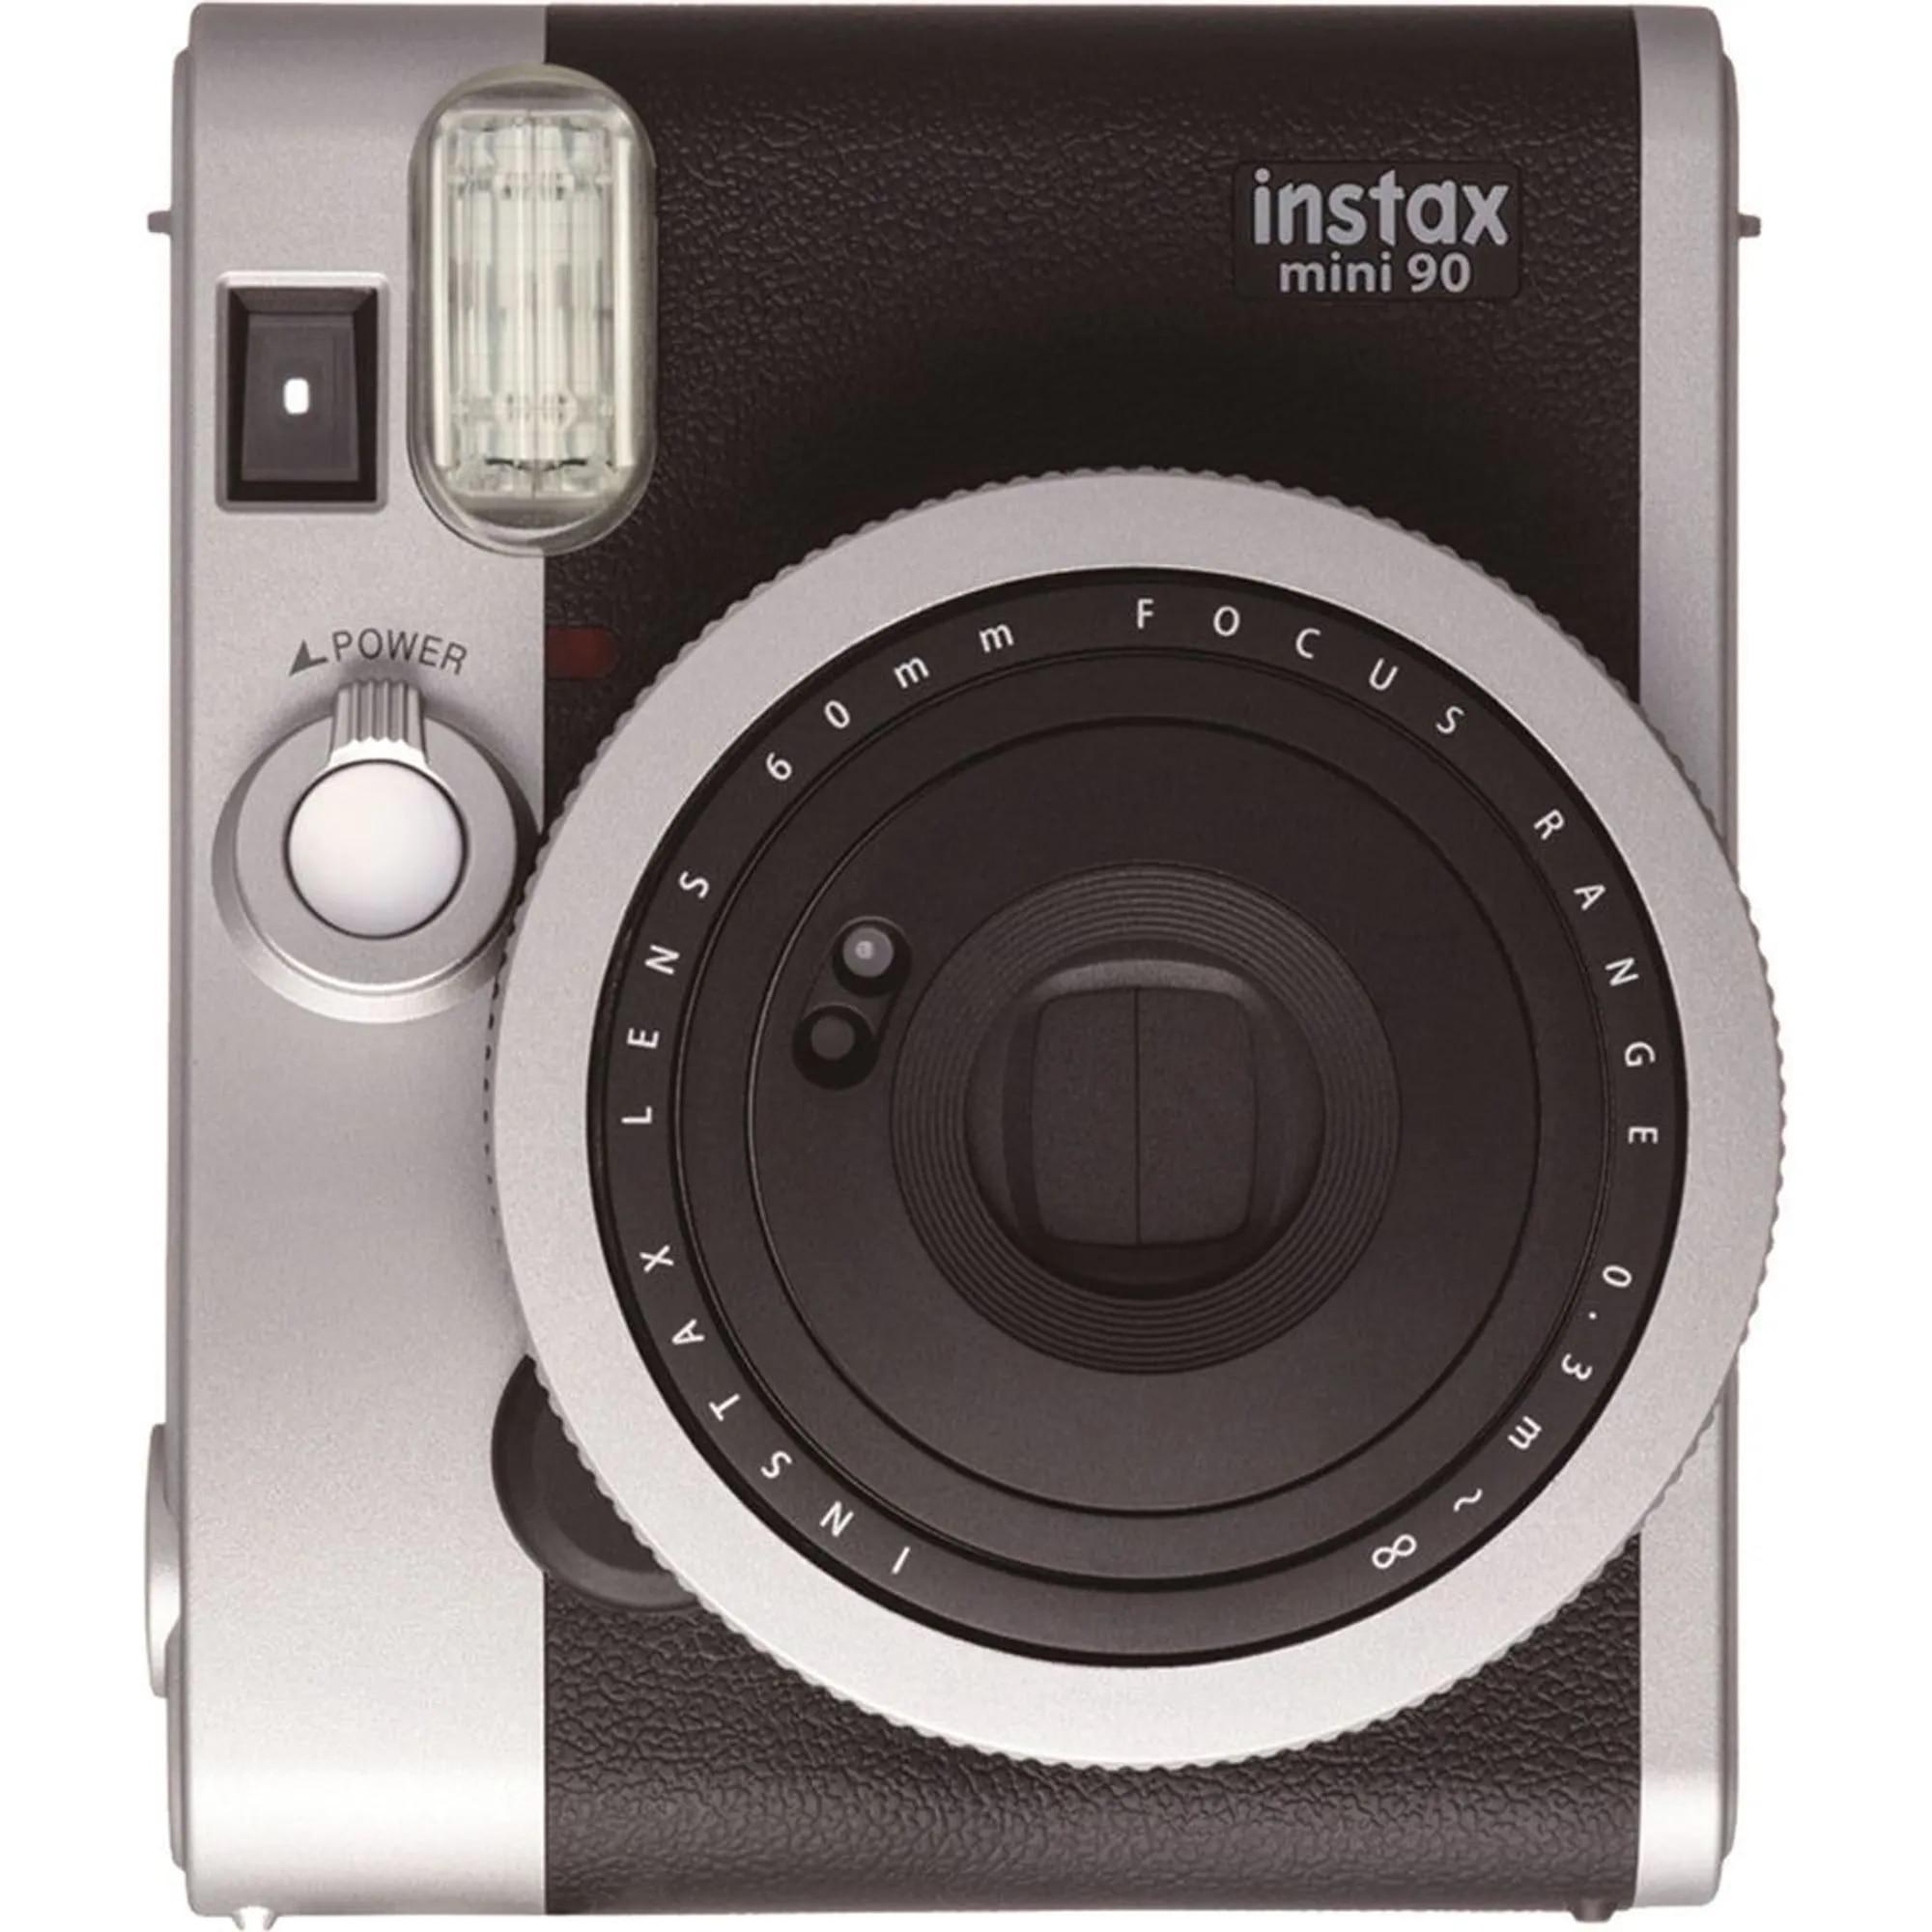 Fotografie Camera foto instant Fujifilm Instax mini 90, Black